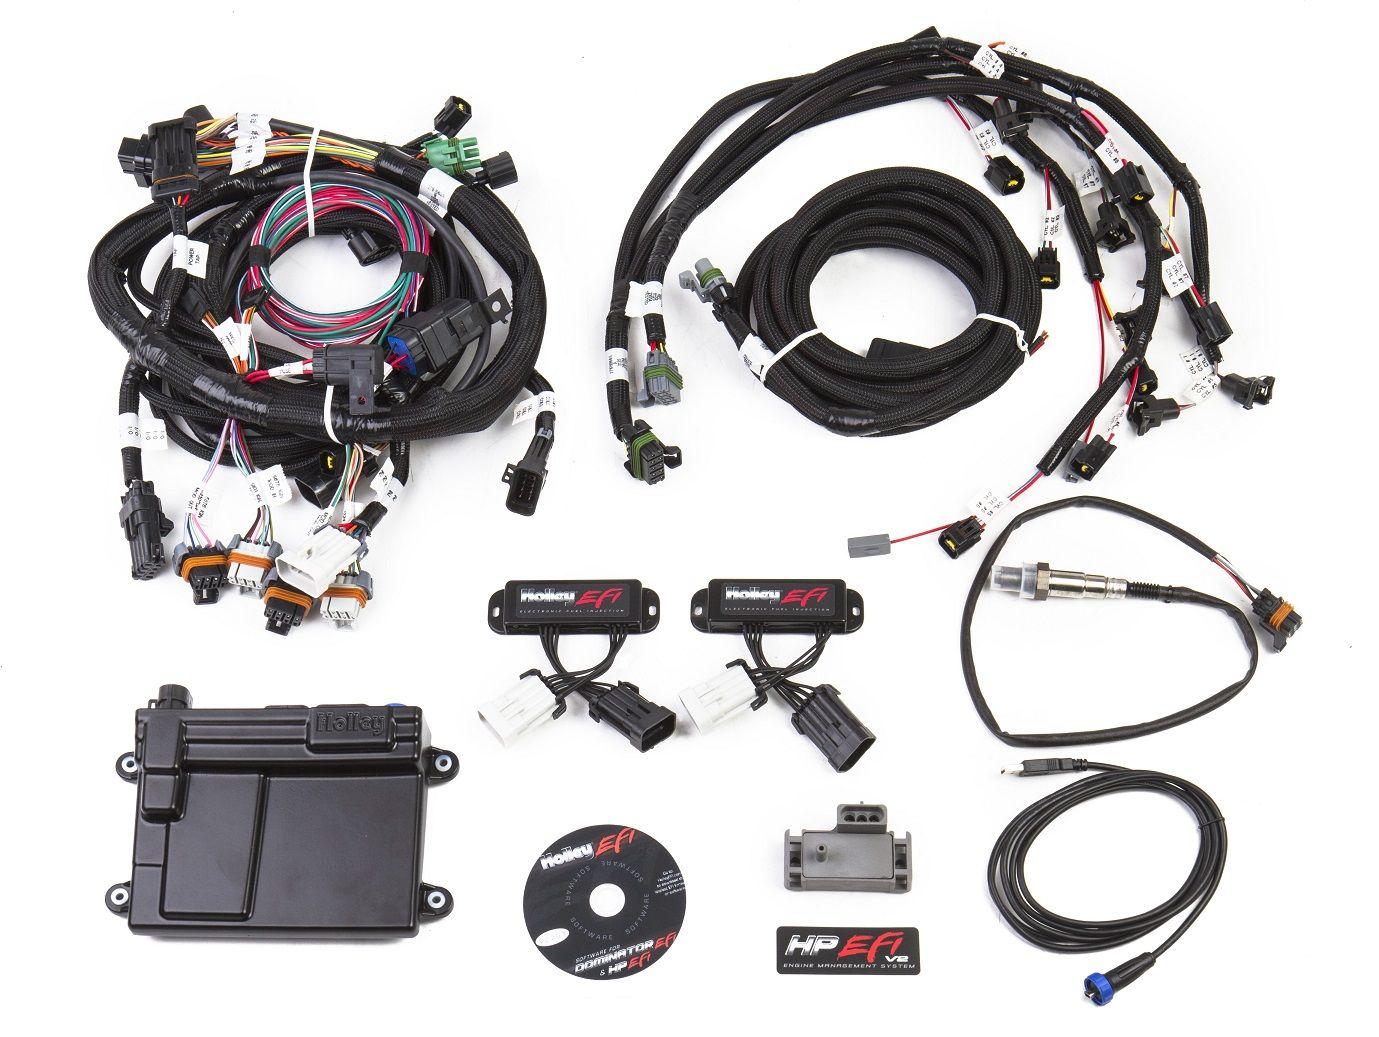 hight resolution of 550 616n hp efi ecu harness kits